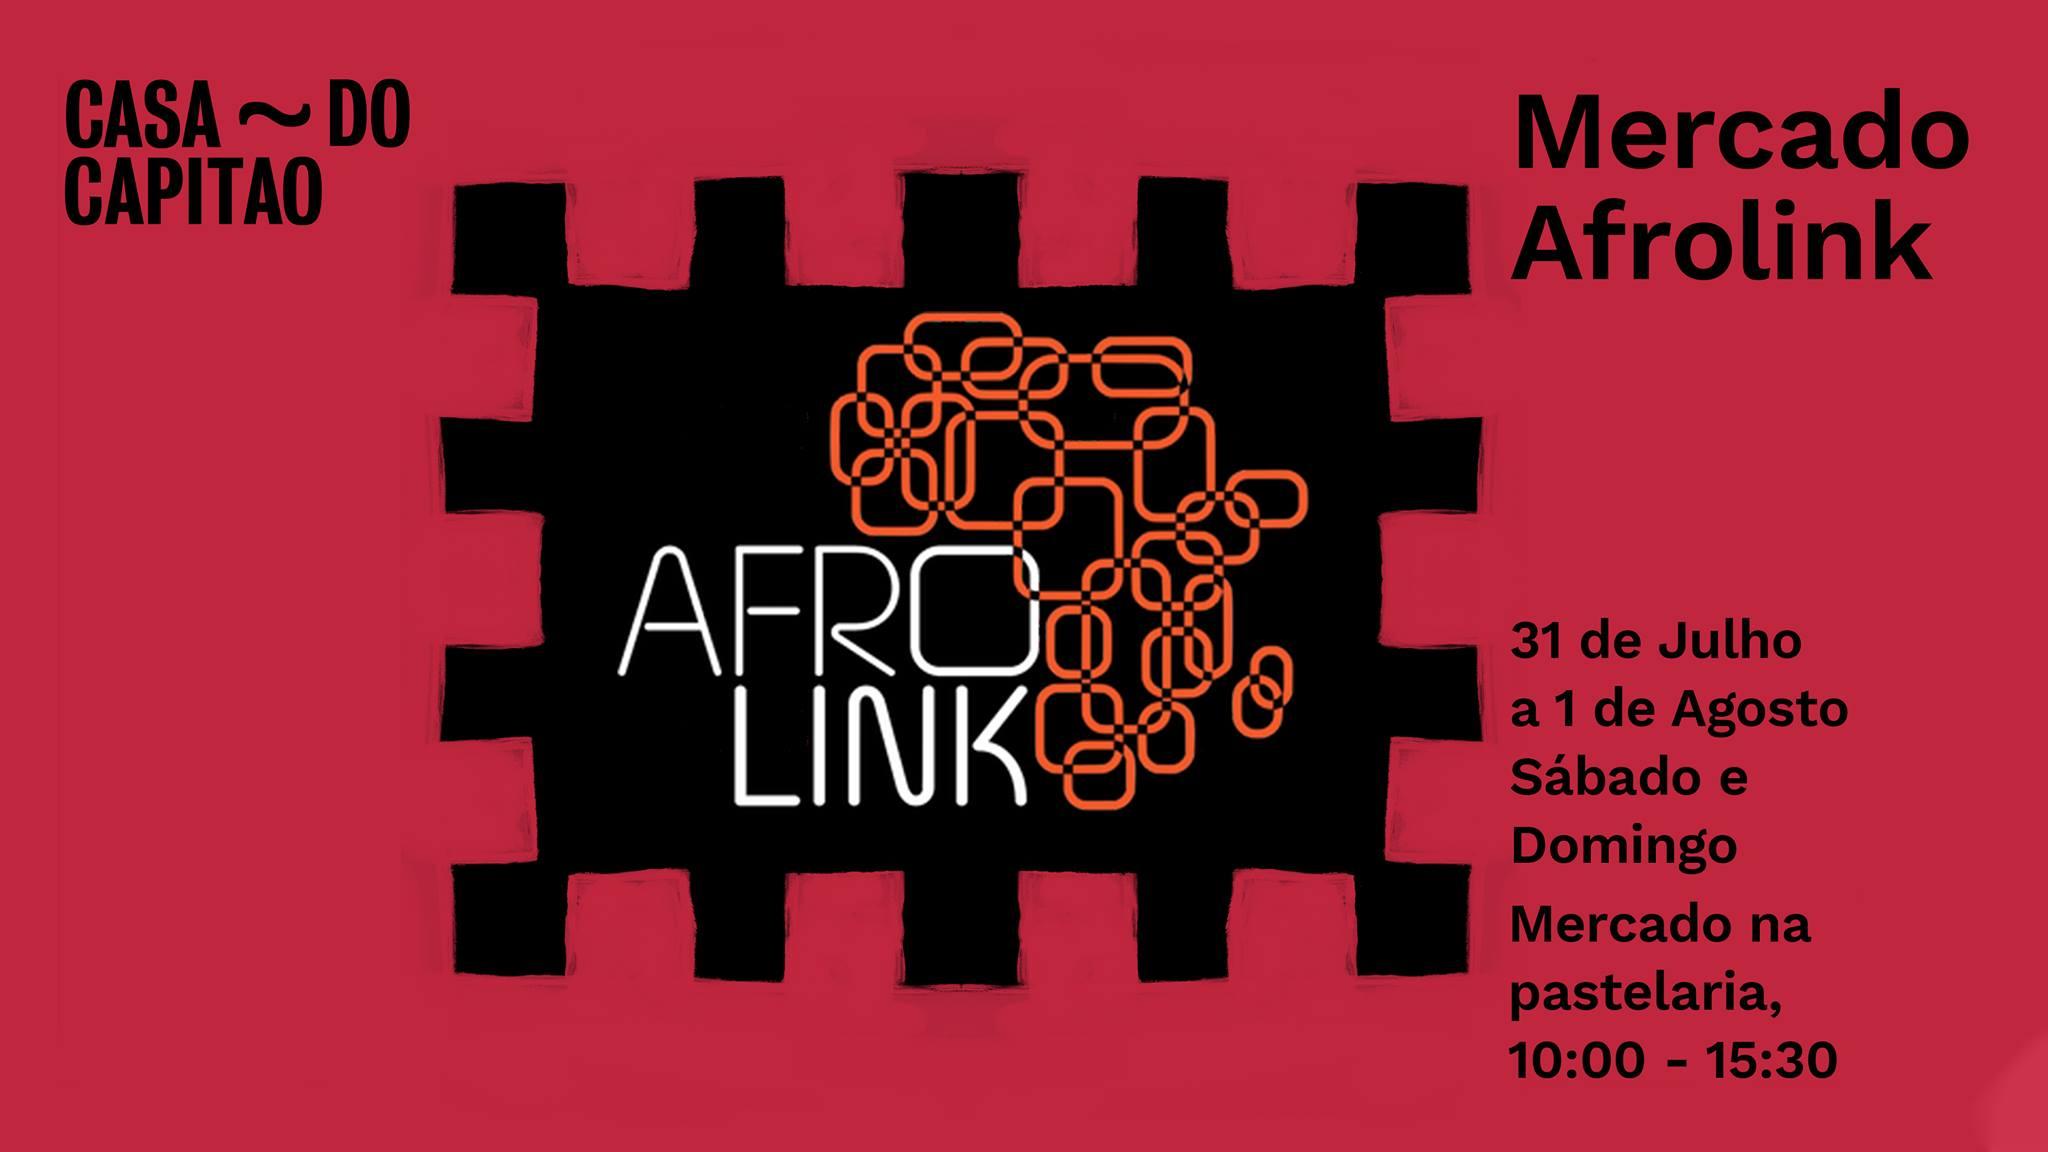 Mercado Afrolink